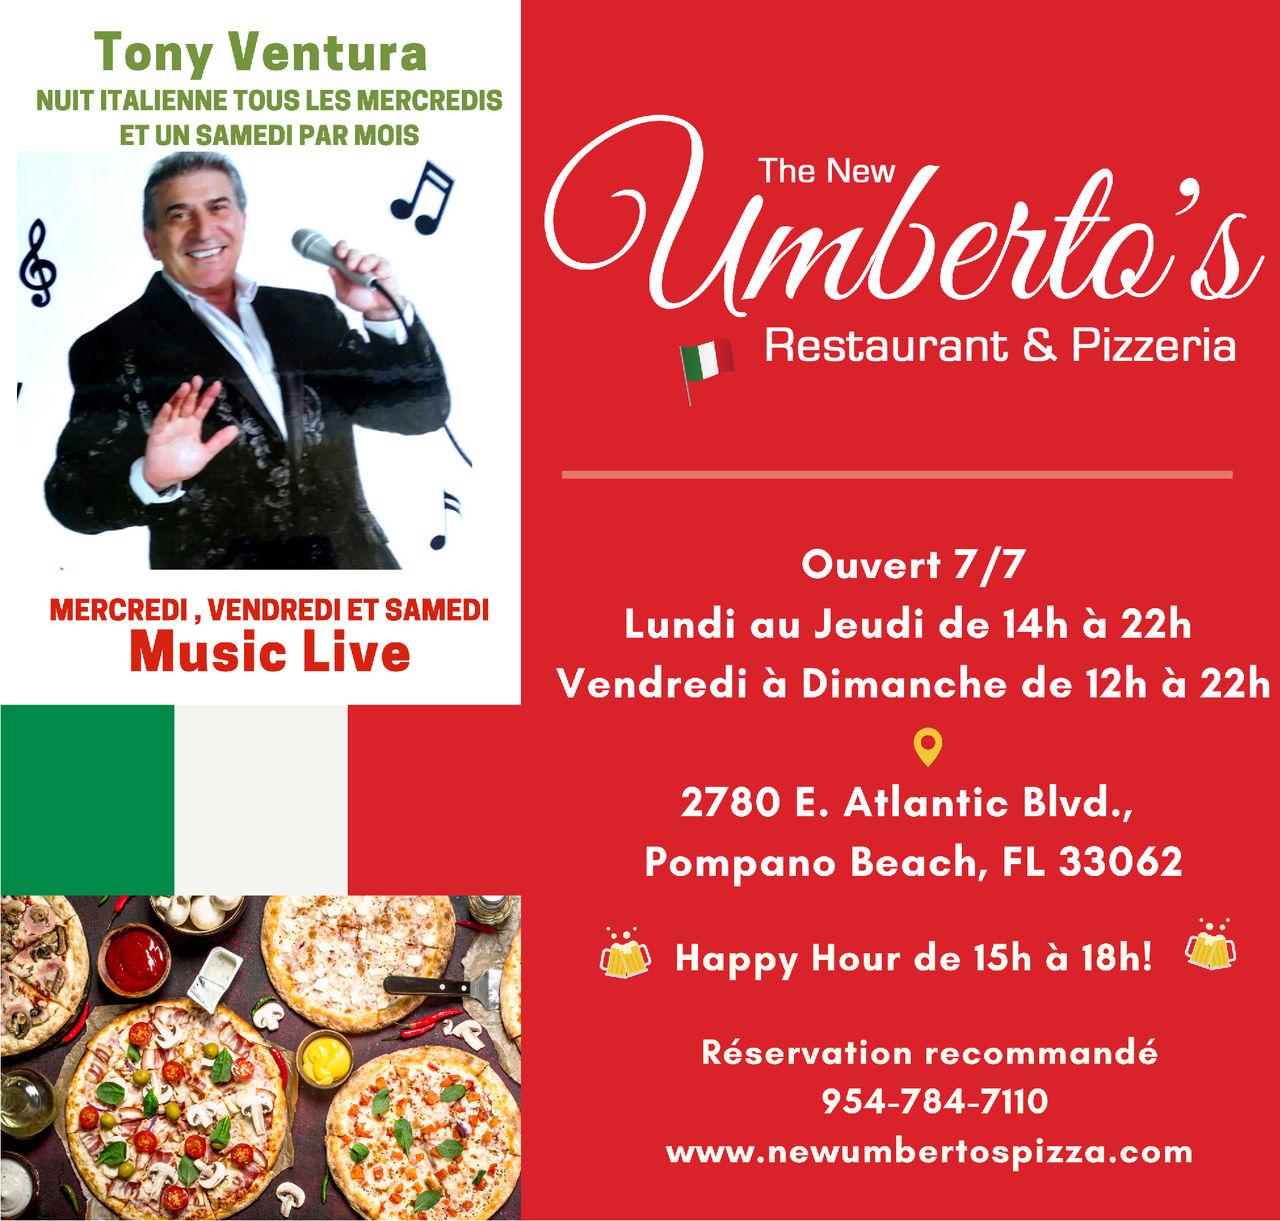 Pizzeria et restaurant à Pompano Beach : Umberto's